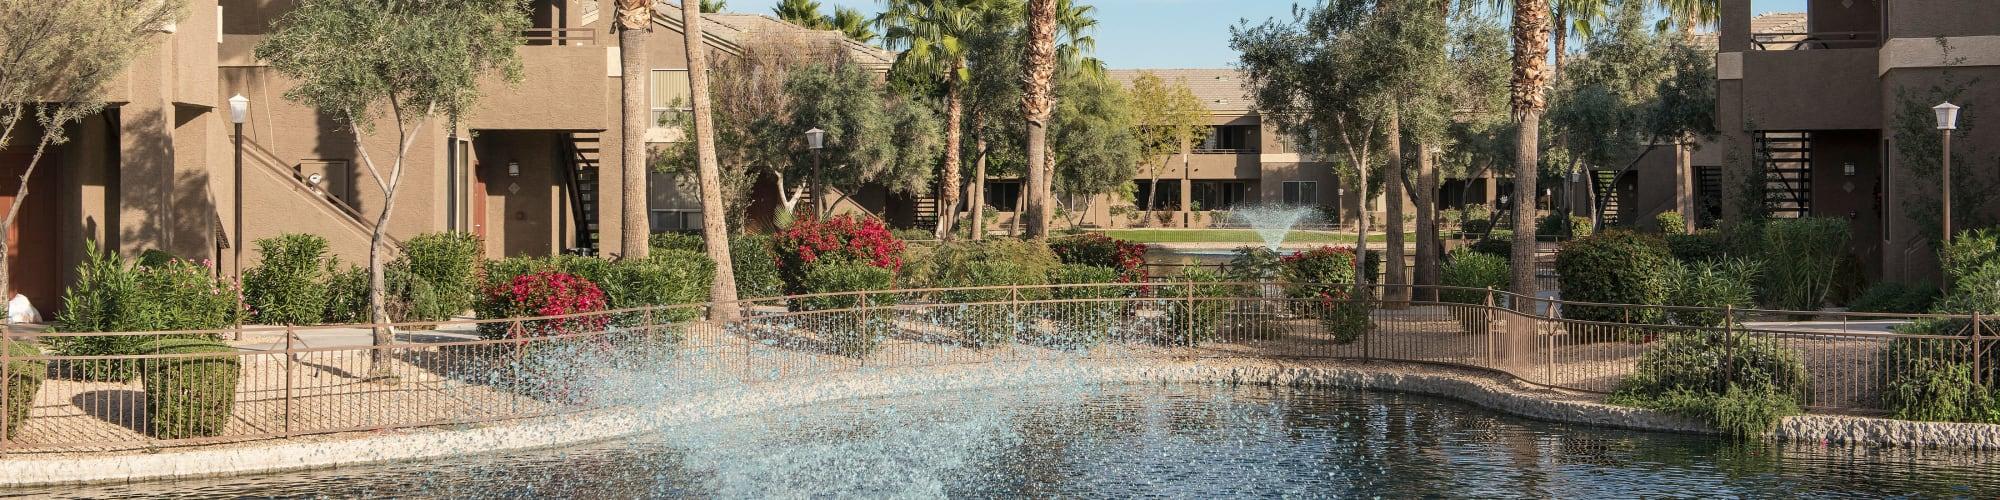 Photos of Laguna at Arrowhead Ranch in Glendale, Arizona